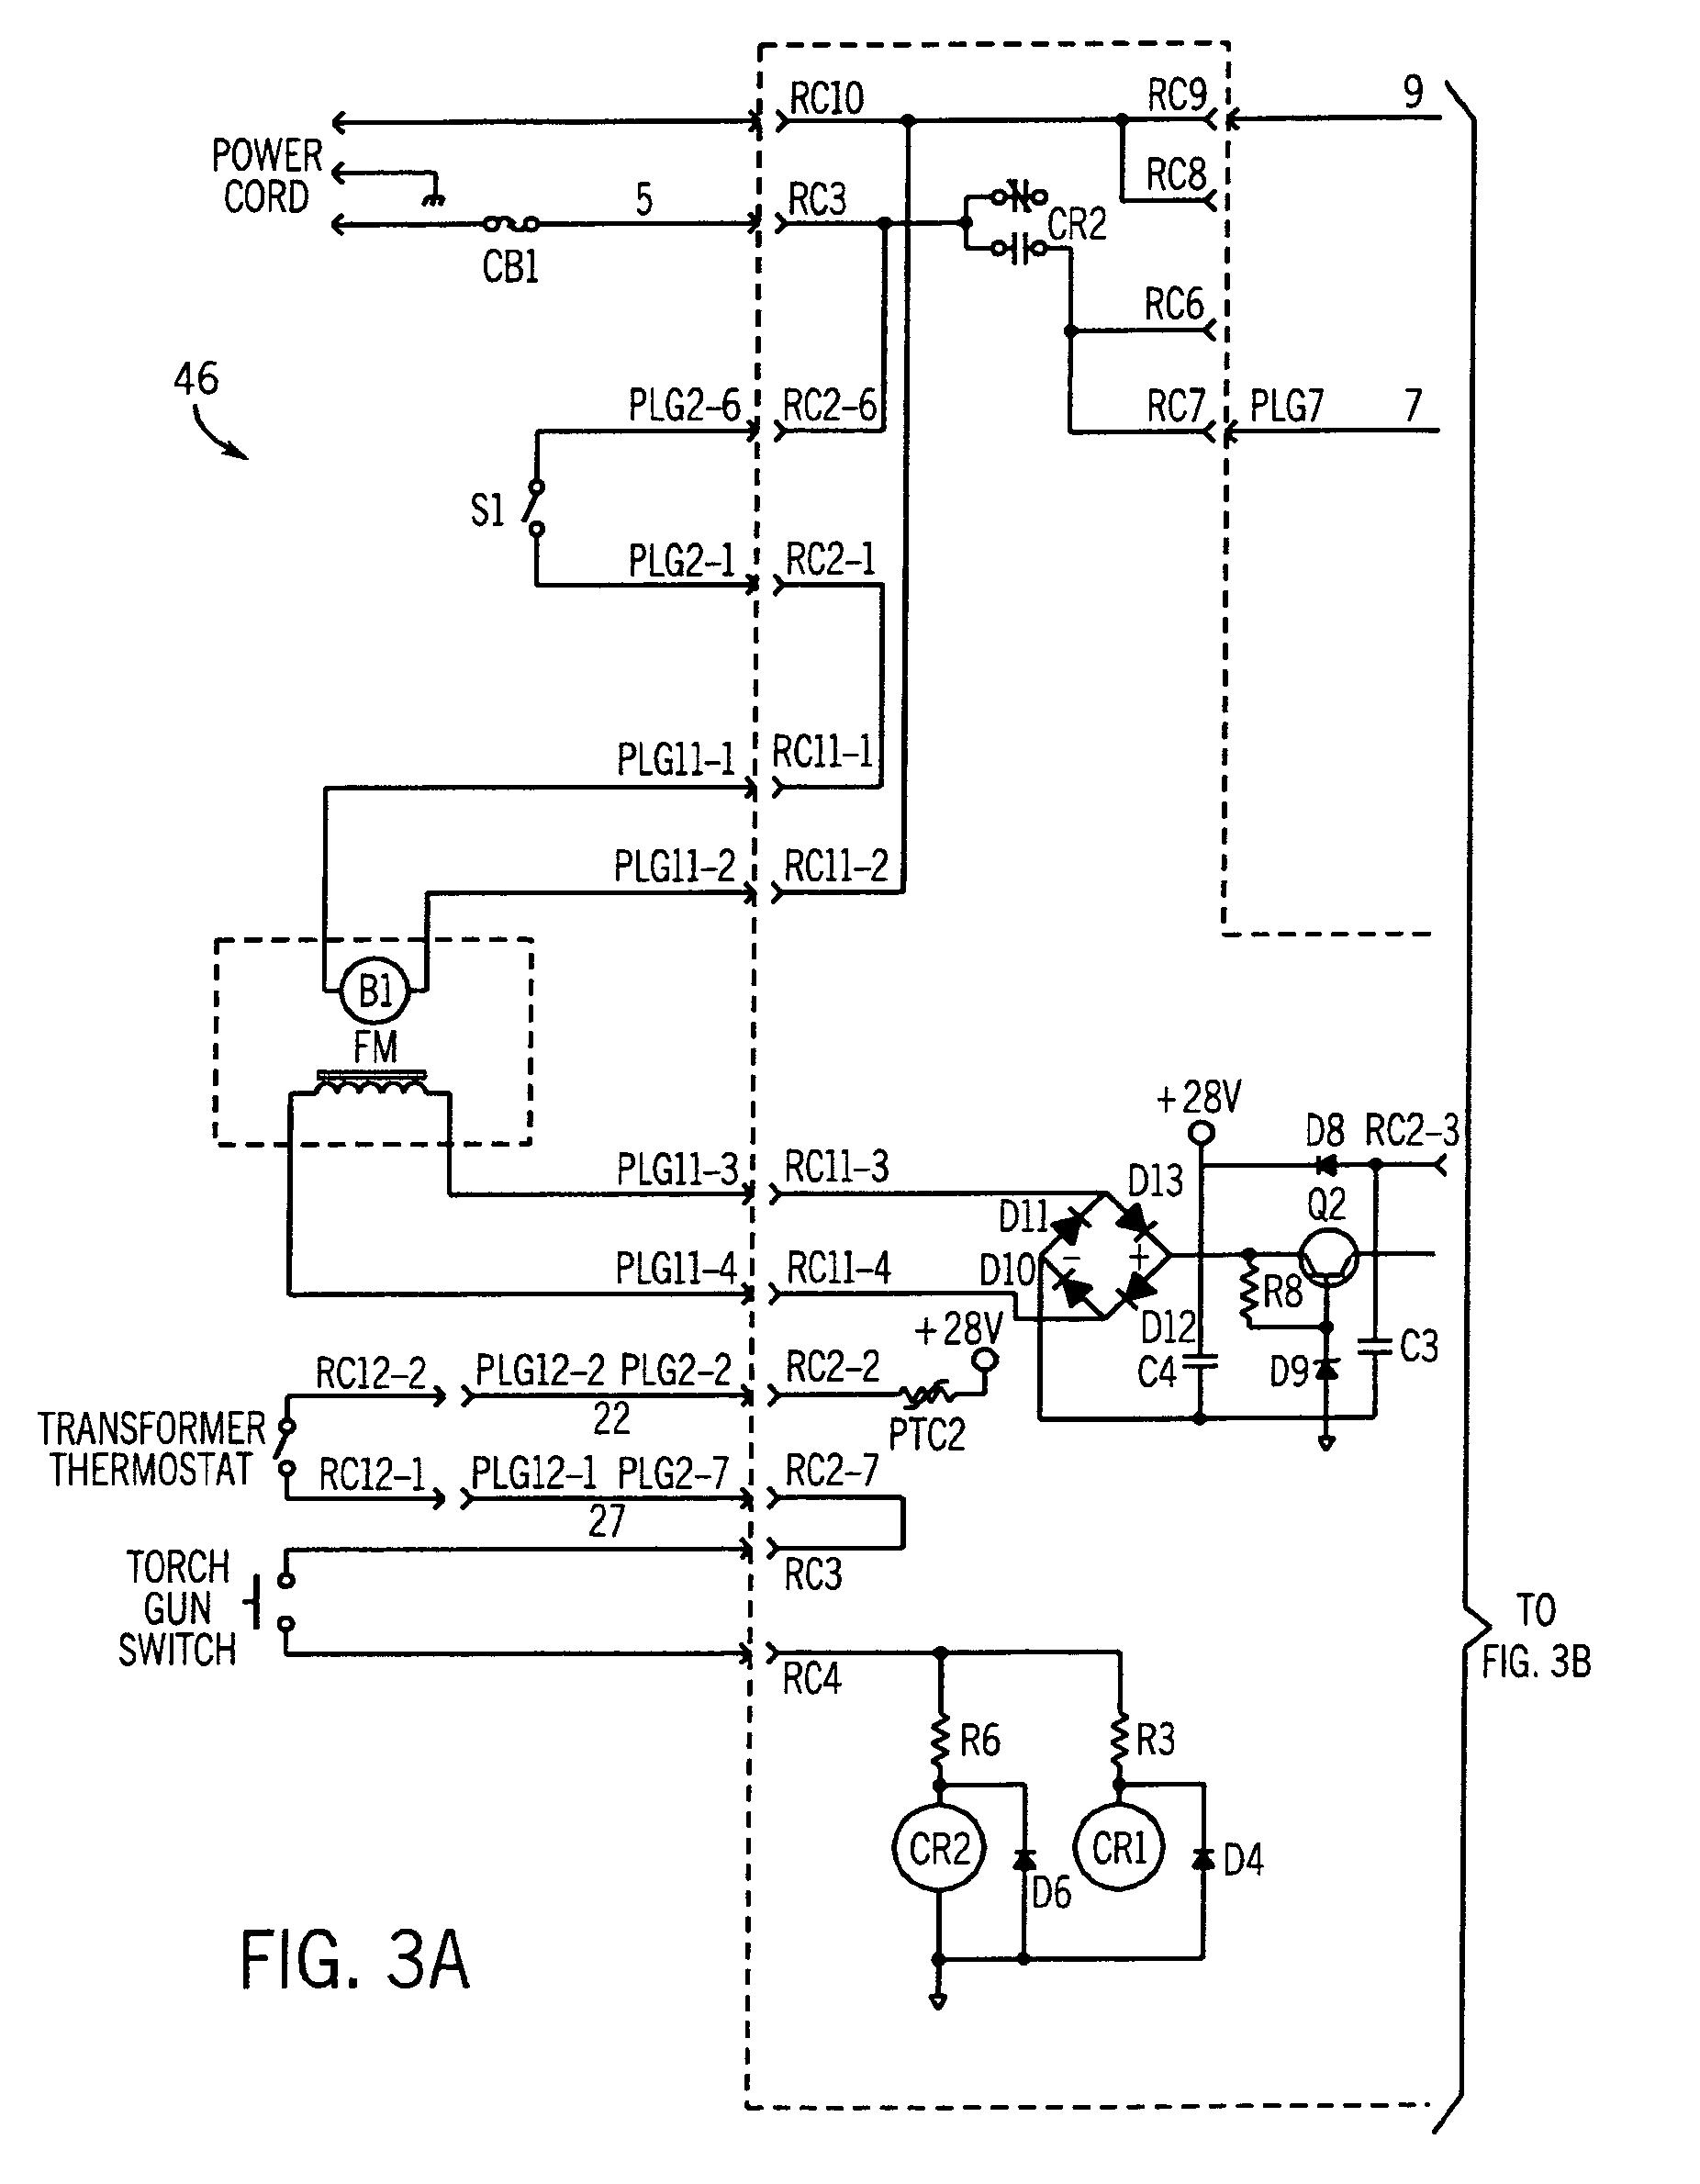 hobart handler 120 wiring diagram - Wiring Diagram